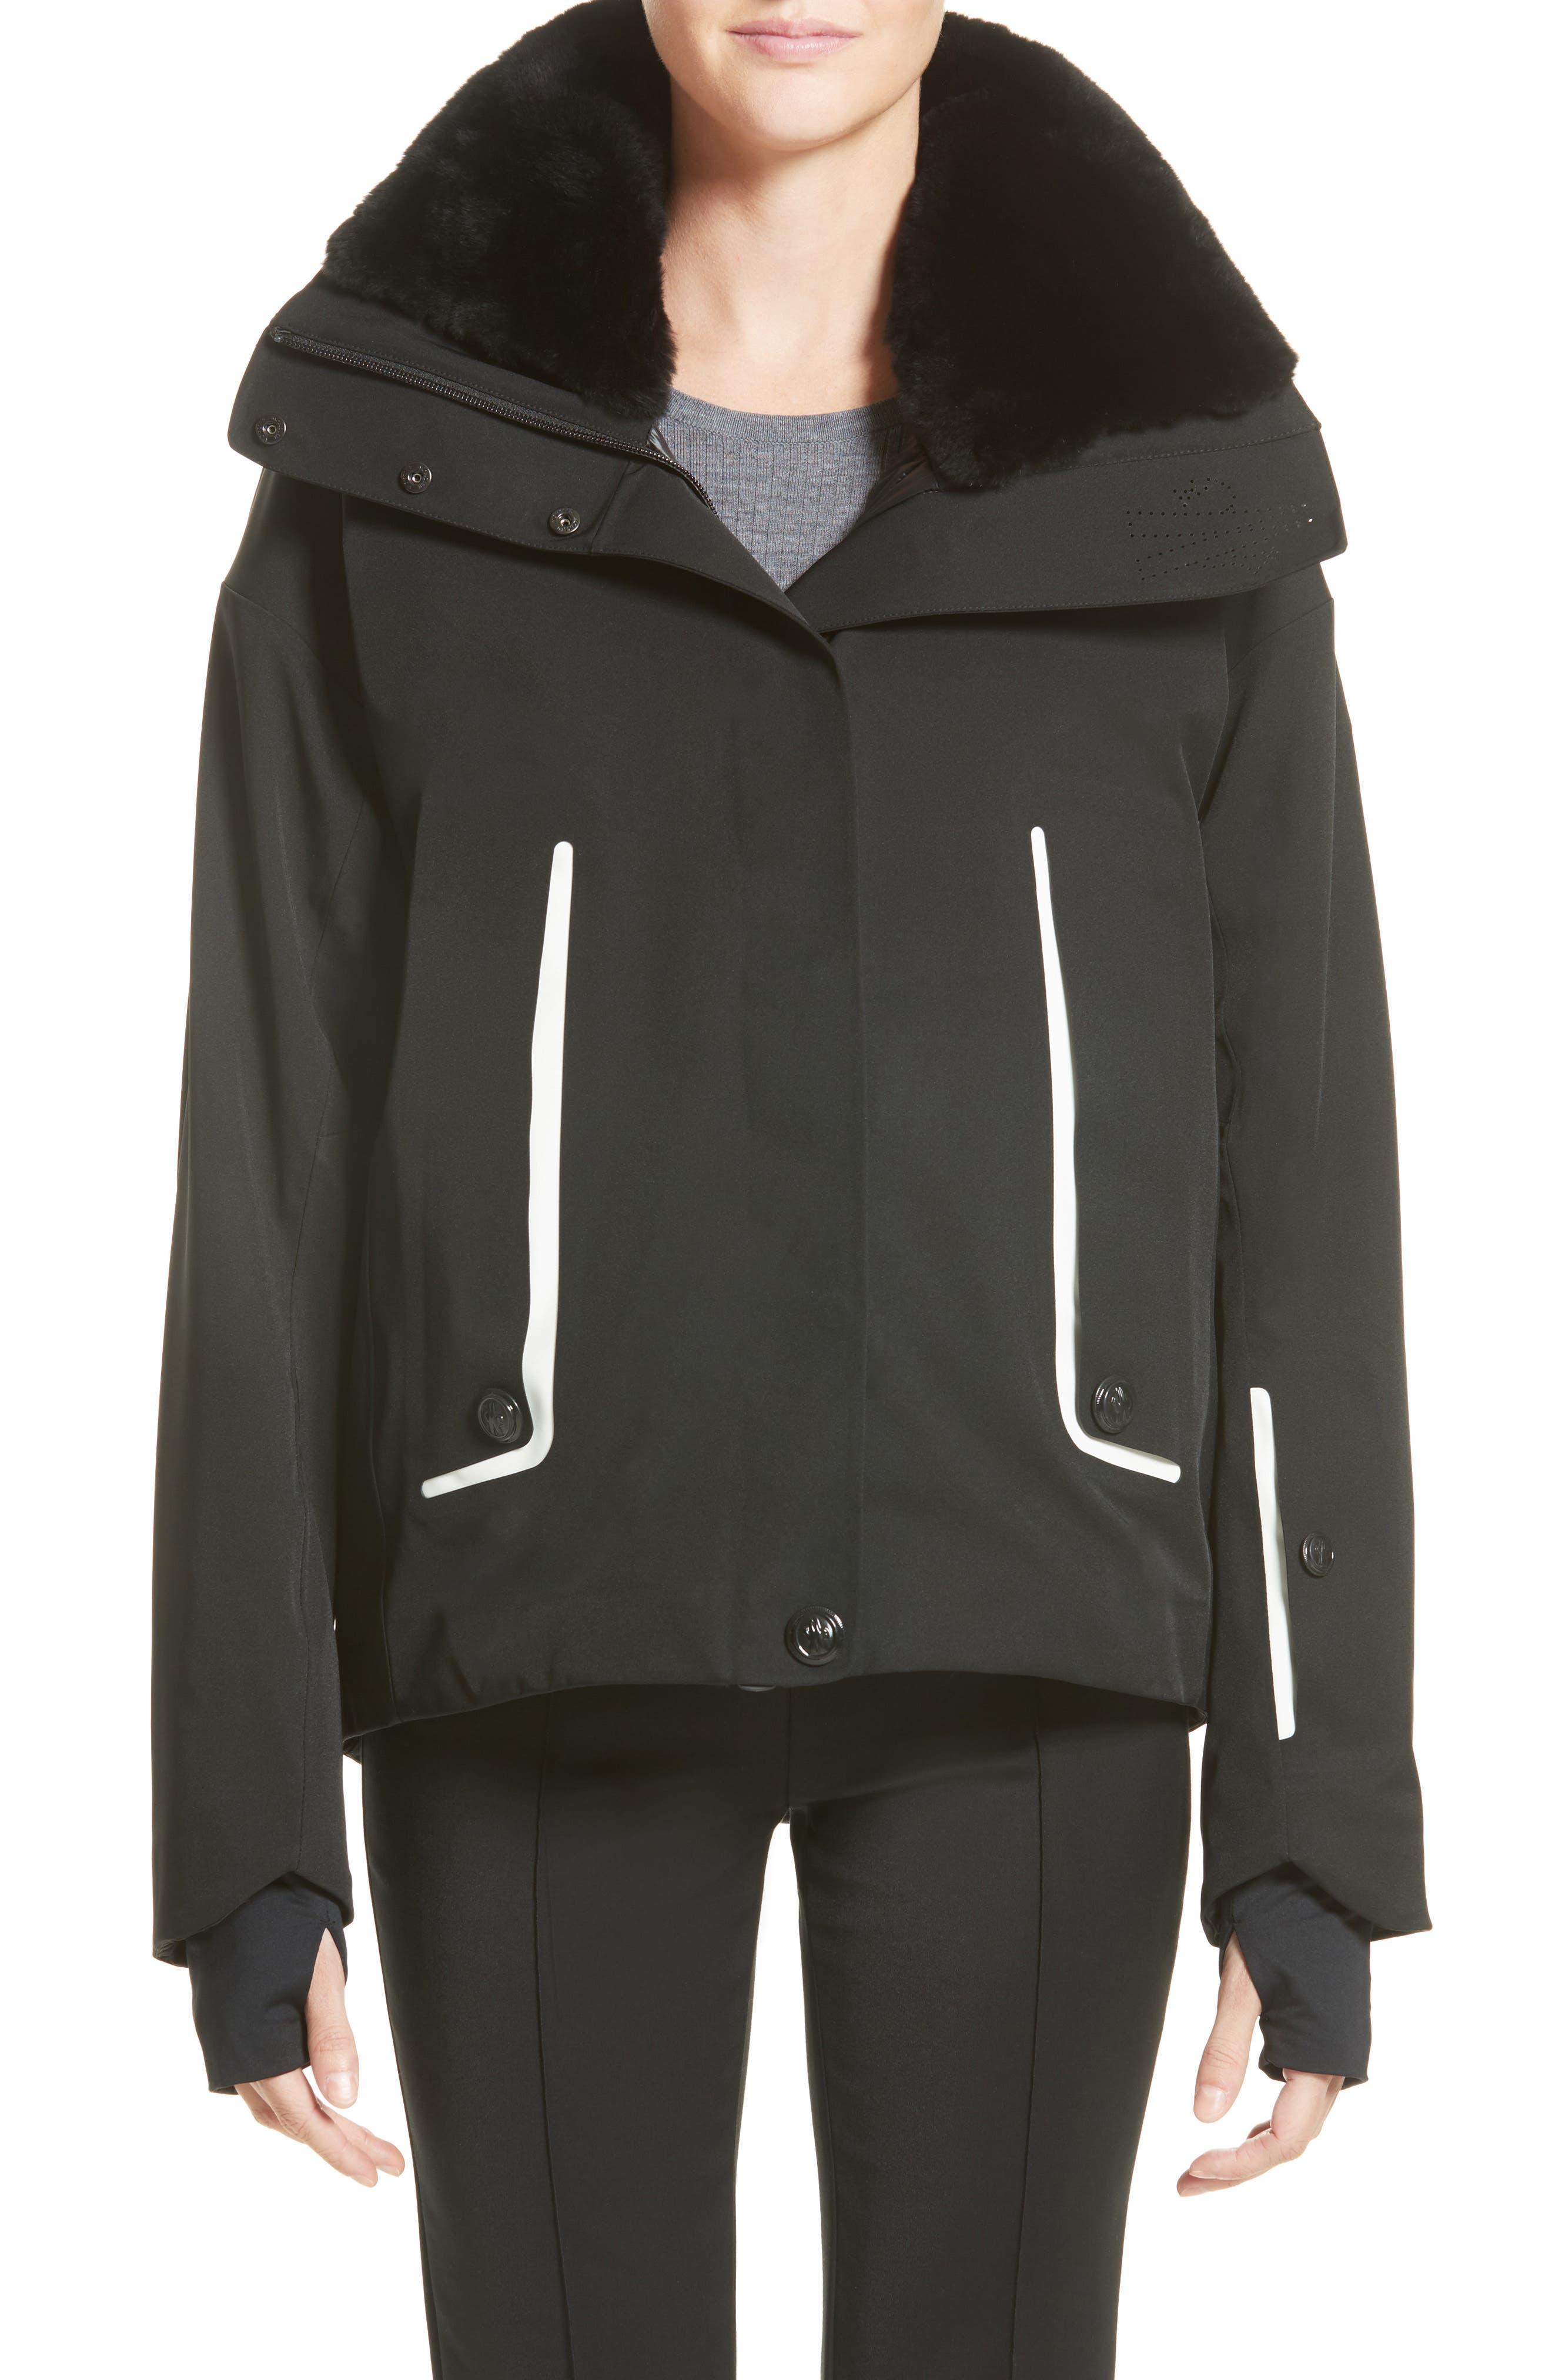 Troisvallees Jacket with Genuine Nutria Fur Collar,                         Main,                         color, Black/ White